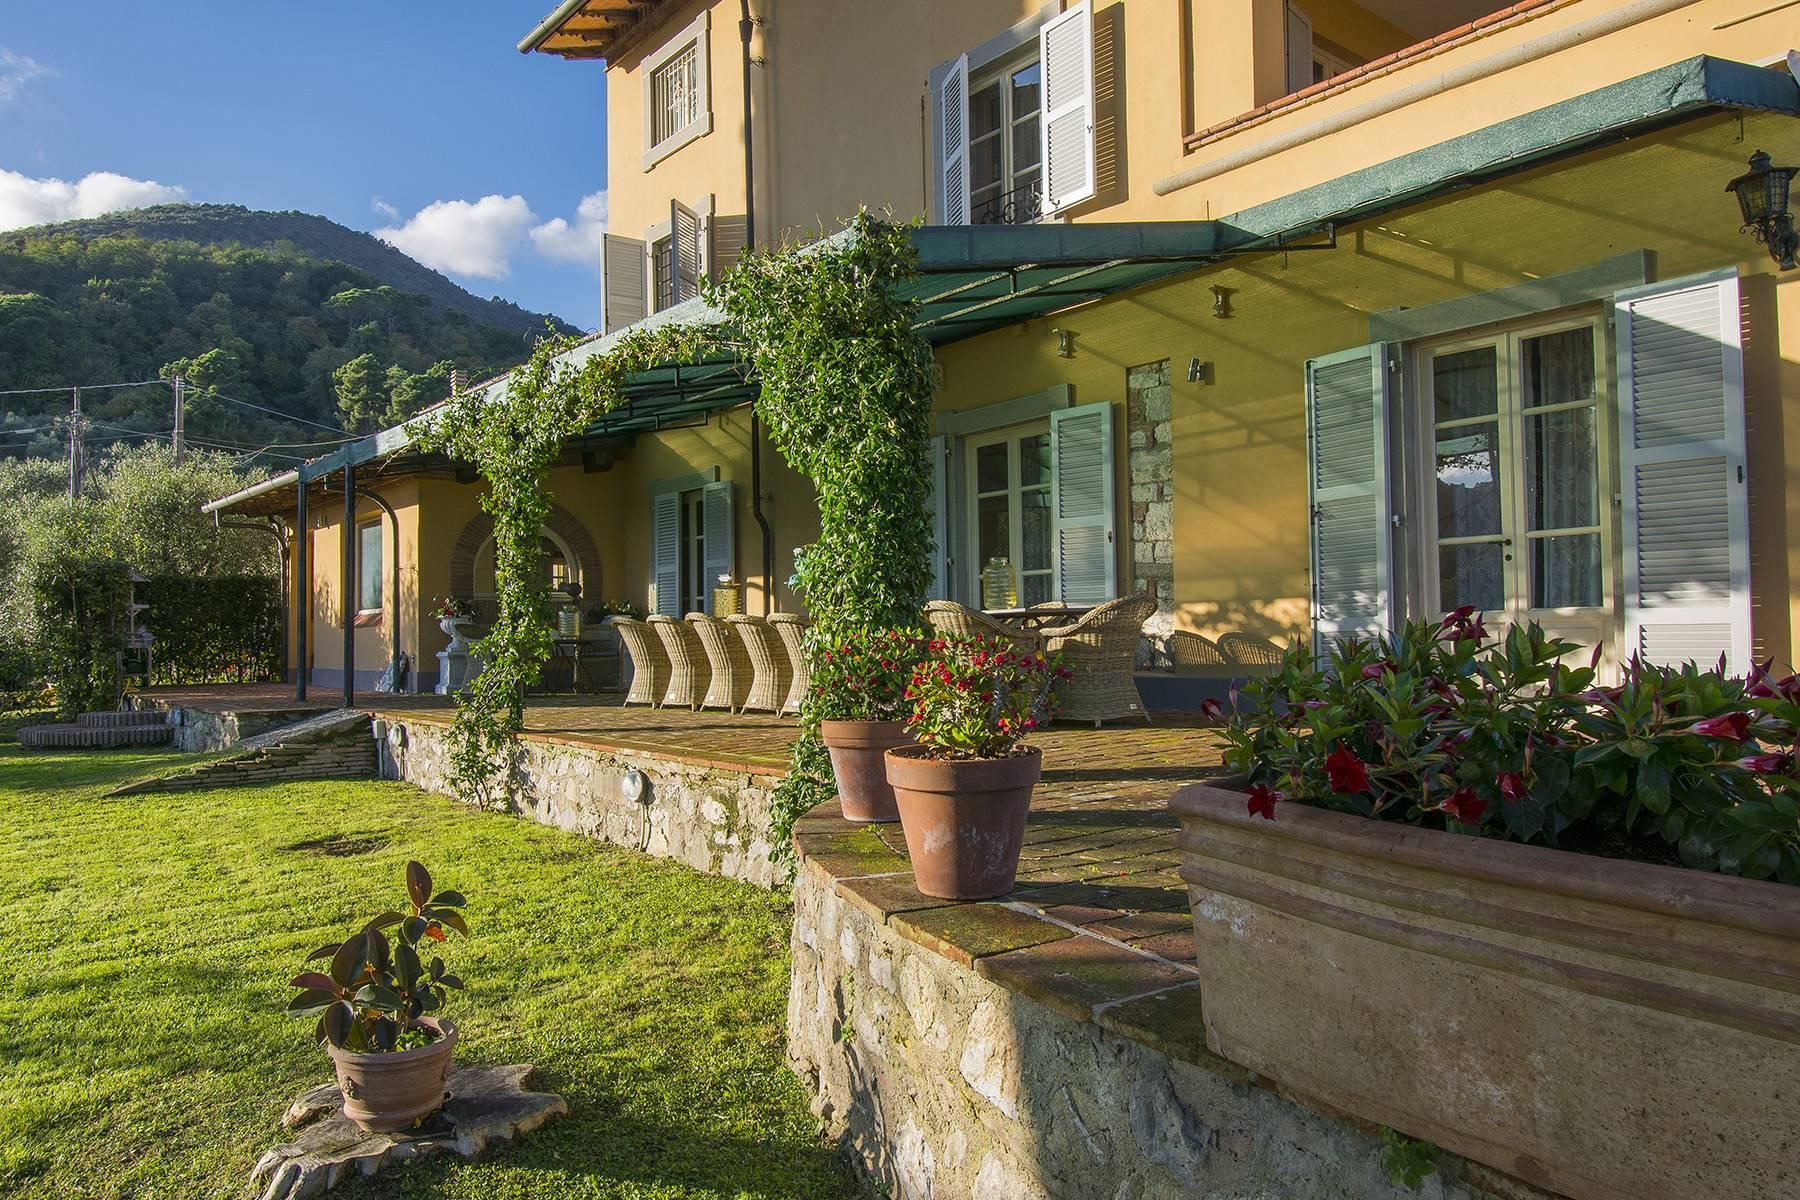 Romantic luxury Villa on the hills of Lucca - 2